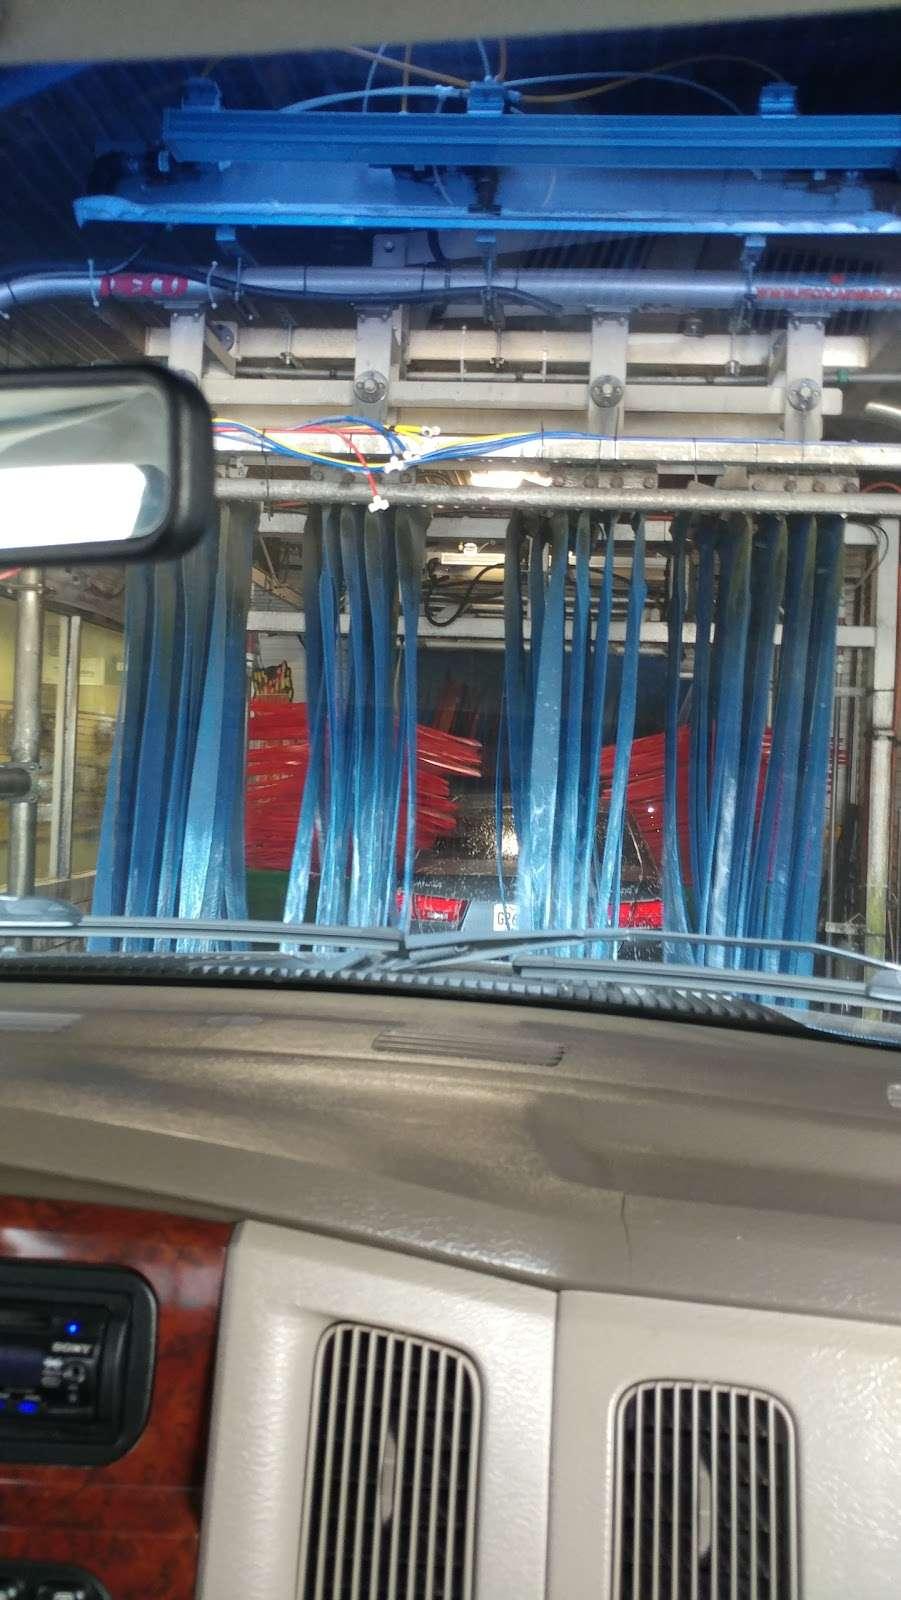 City Line Car Wash - car wash  | Photo 5 of 10 | Address: 1505 John F Kennedy Boulevard, 149 w 63RD St Bayonne NJ 07002, Jersey City, NJ 07305, USA | Phone: (201) 434-3355